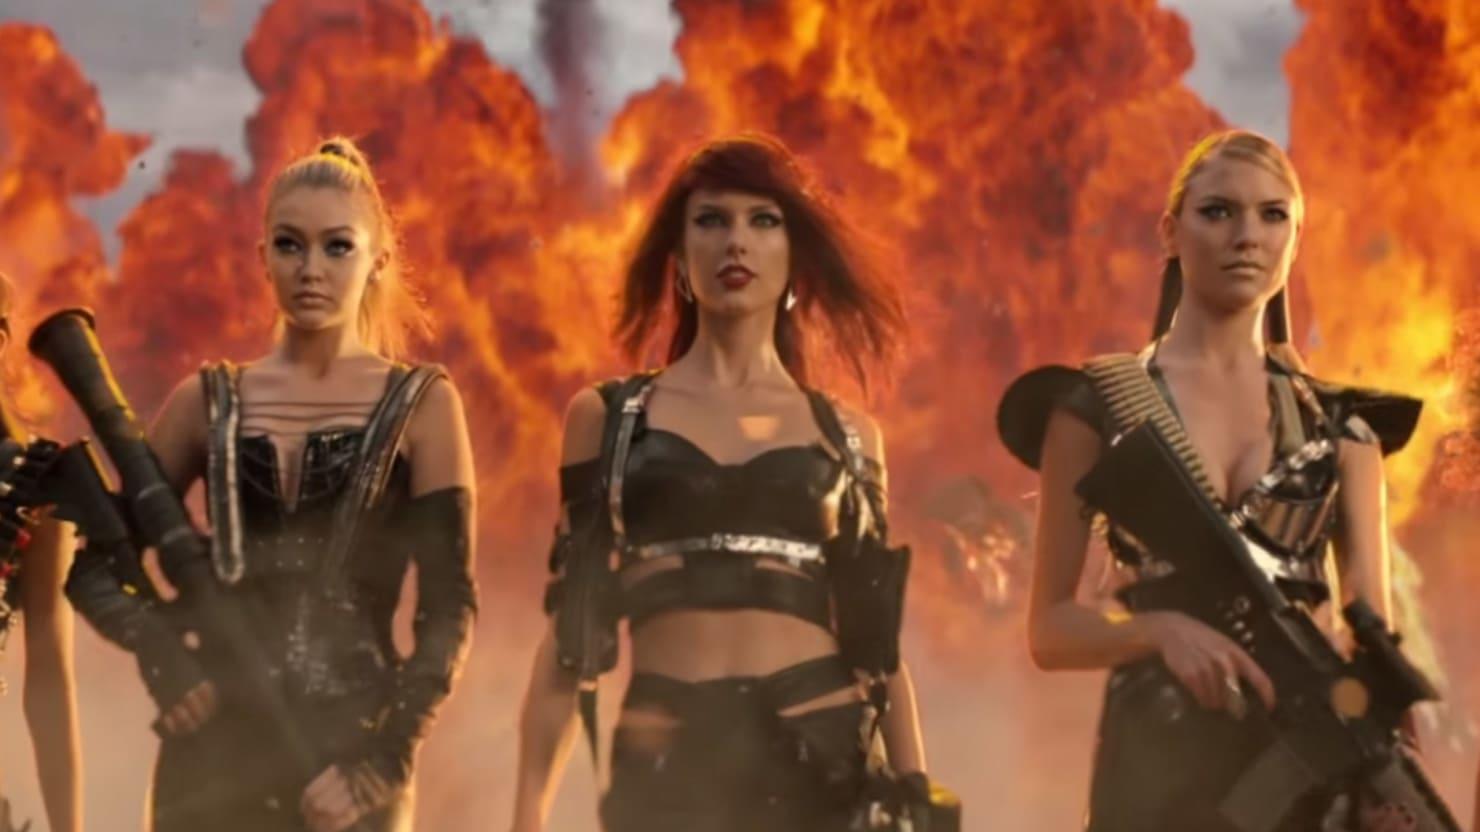 Taylor Swift's 'Bad Blood' Hypocrisy: An Anthem Fit for Regina George